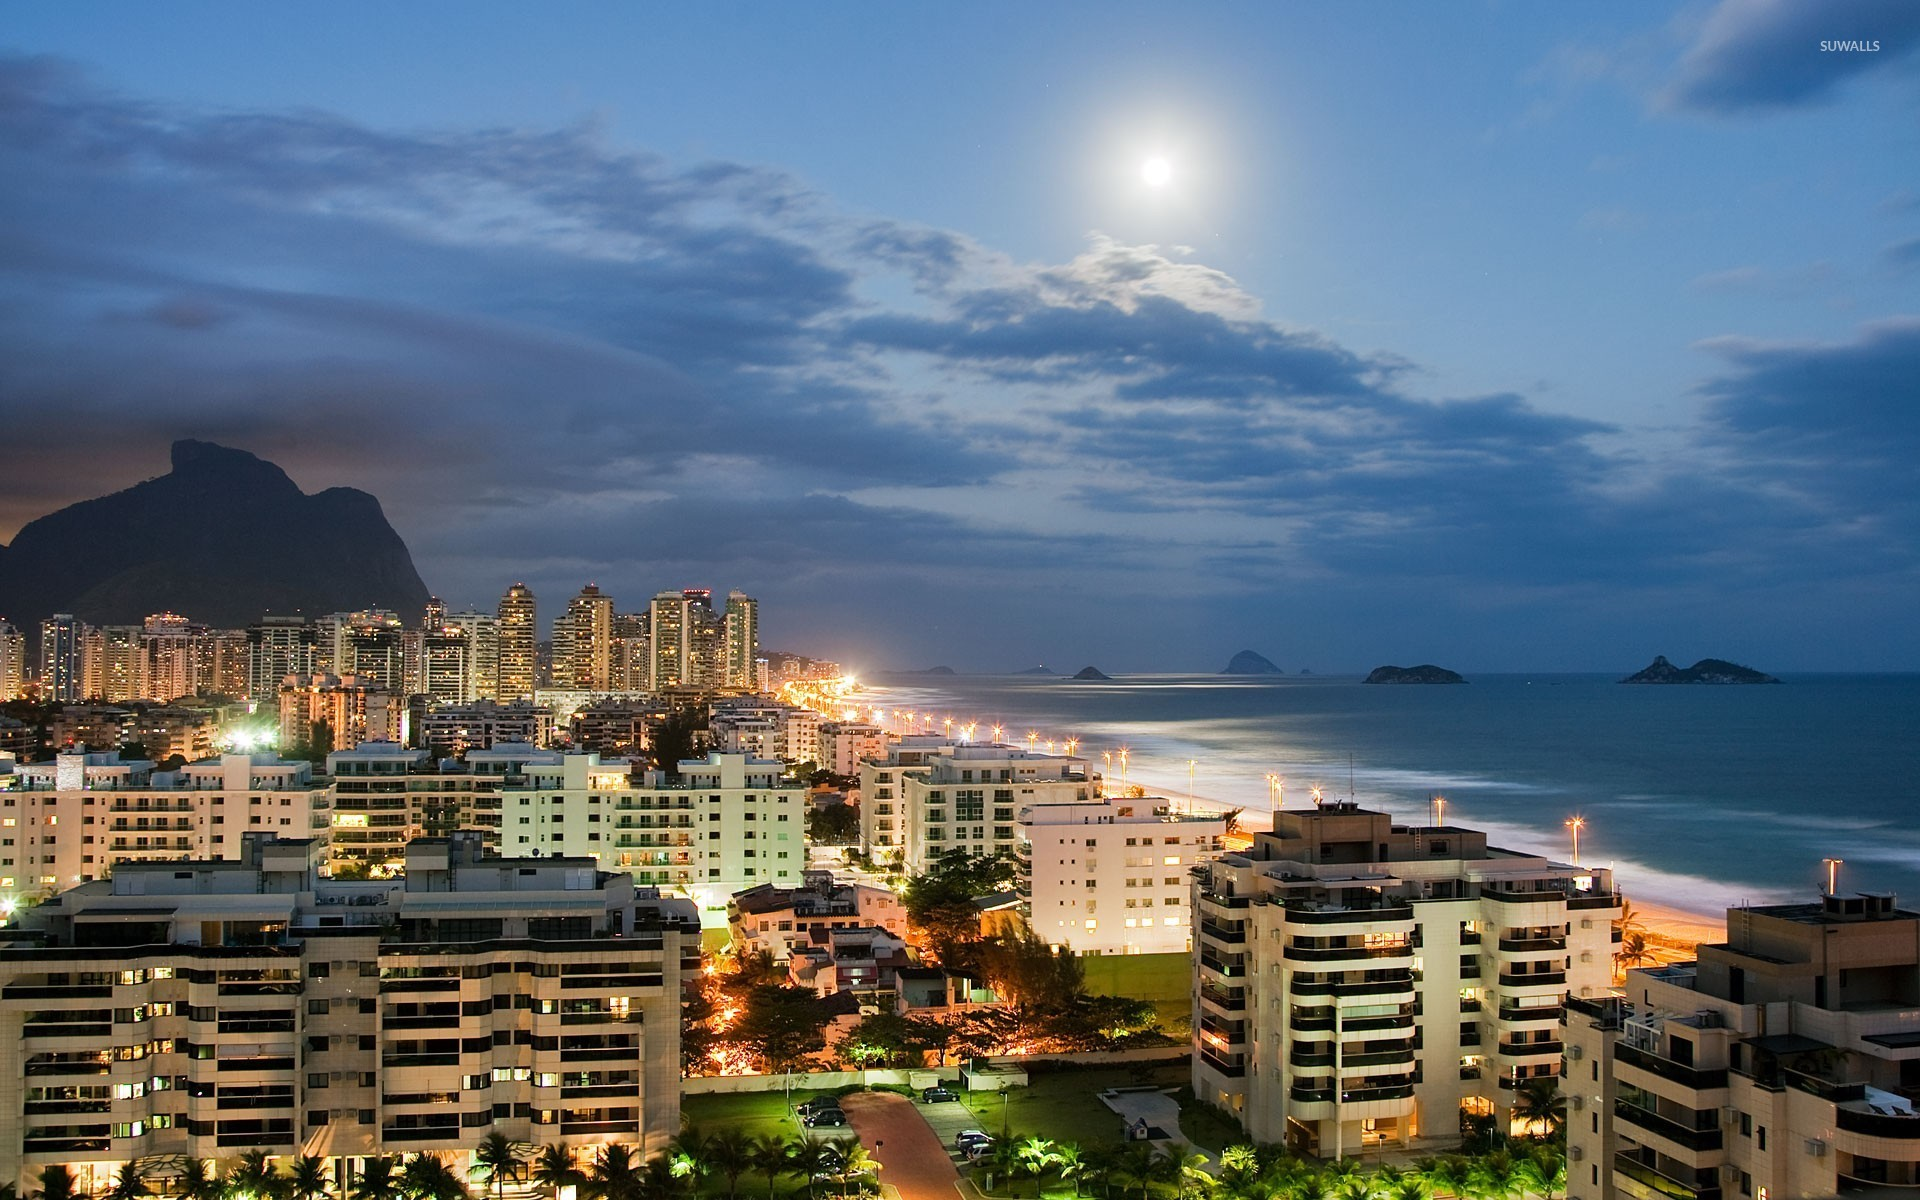 Rio de Janeiro [2] wallpaper   World wallpapers   25620 1920x1200